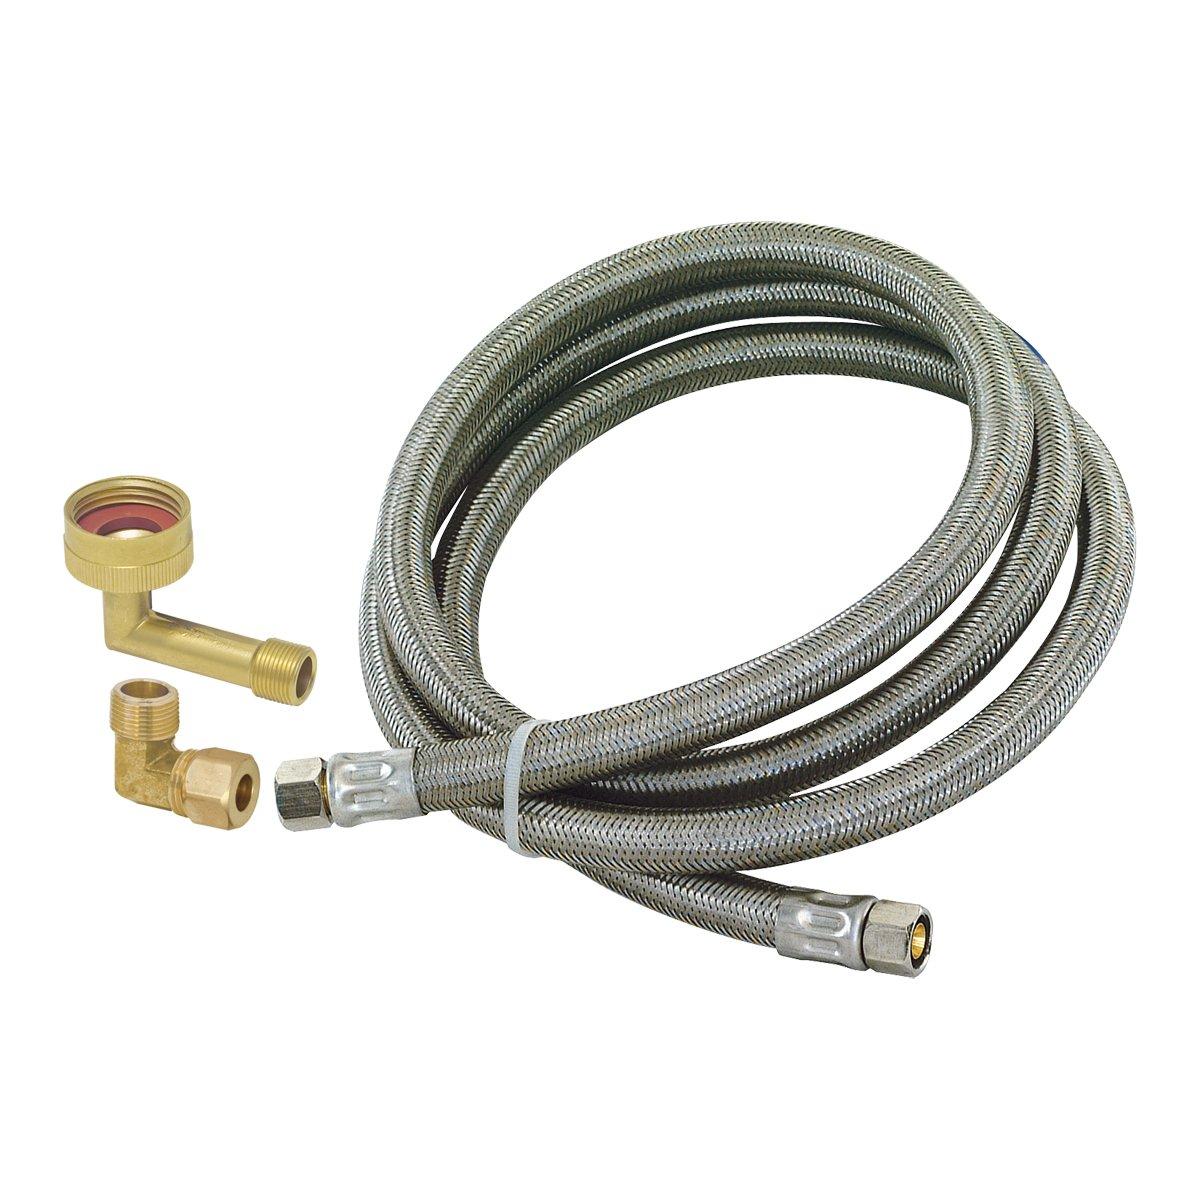 Eastman 41037 Universal Stainless Steel Dishwasher Installation Kit 4'